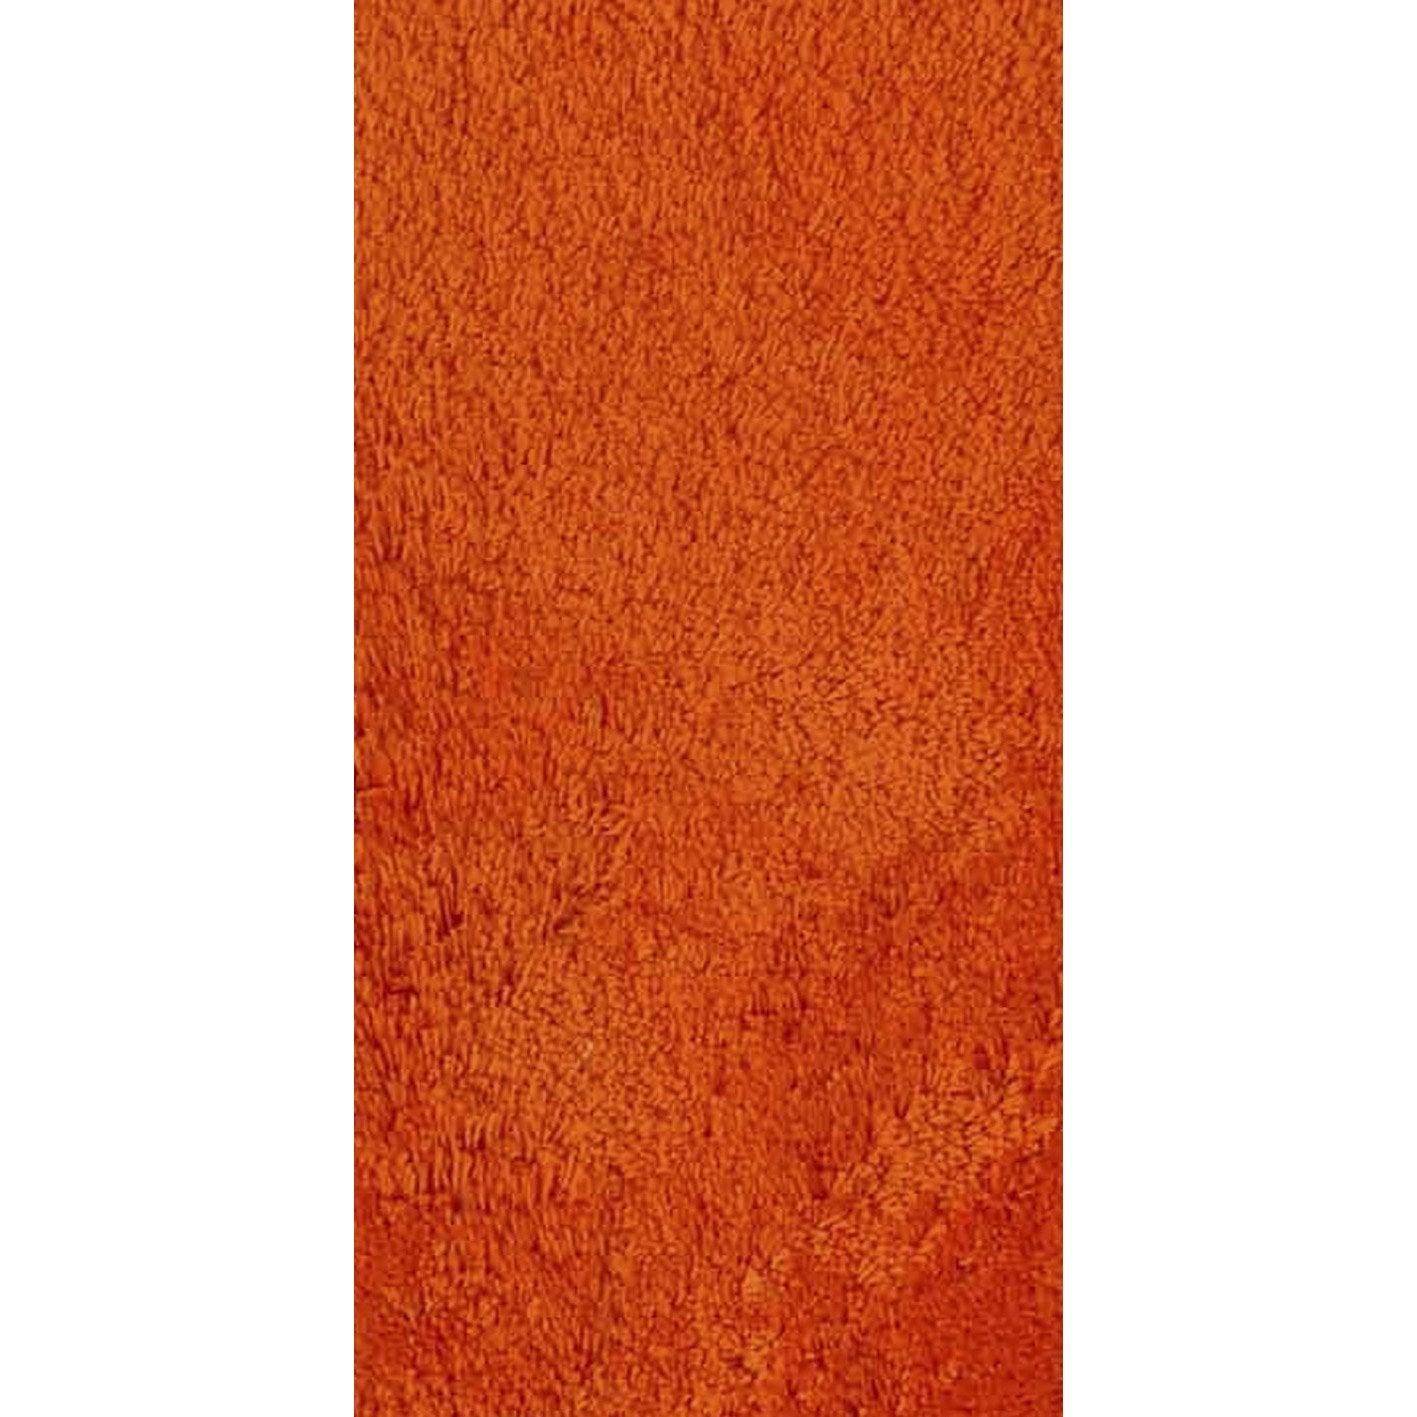 tapis orange shaggy agathe x cm leroy merlin. Black Bedroom Furniture Sets. Home Design Ideas